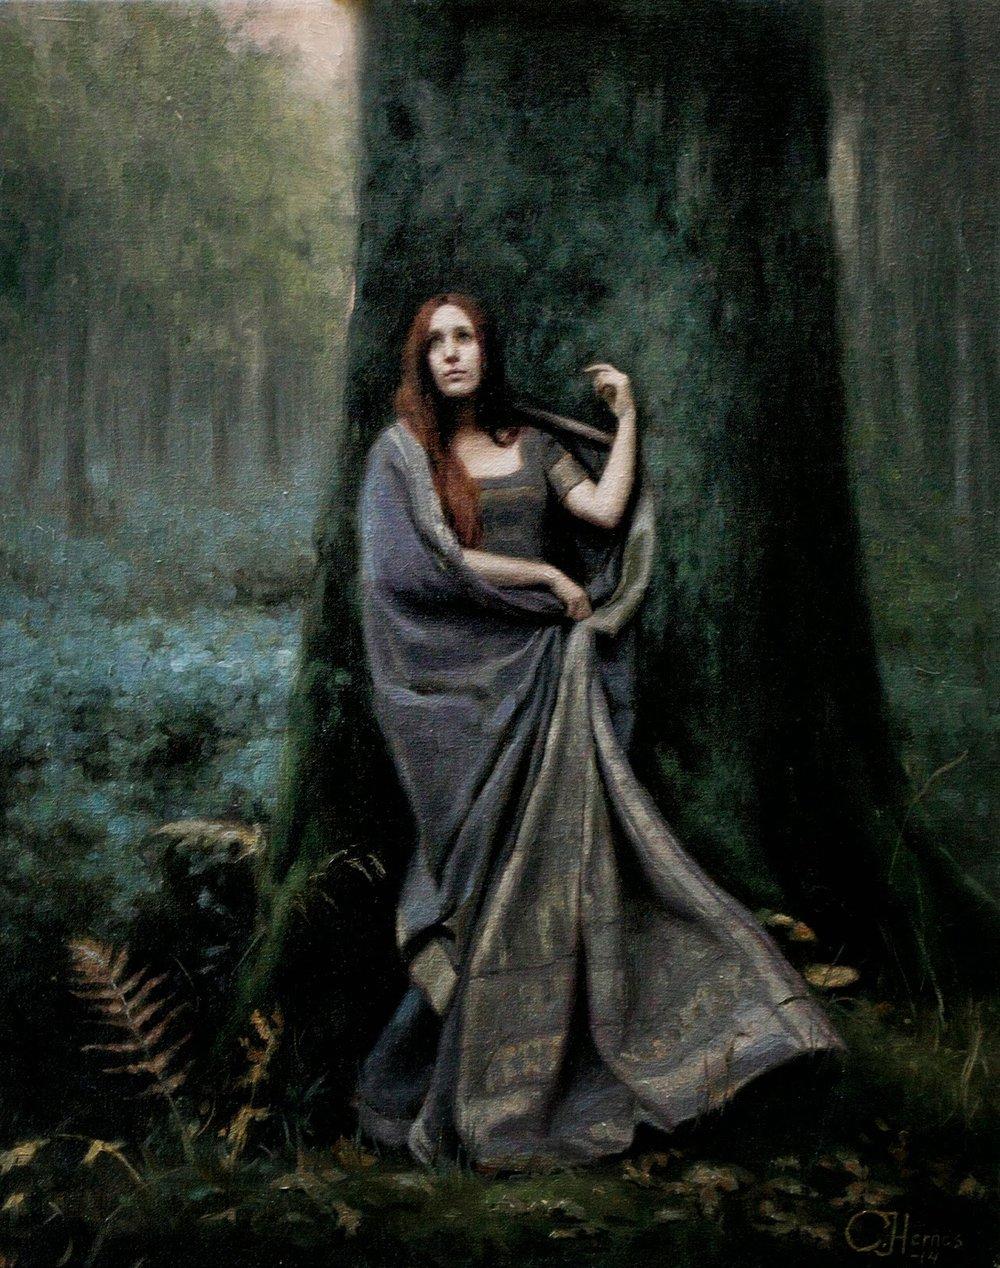 Cocoon by Cornelia Hernes